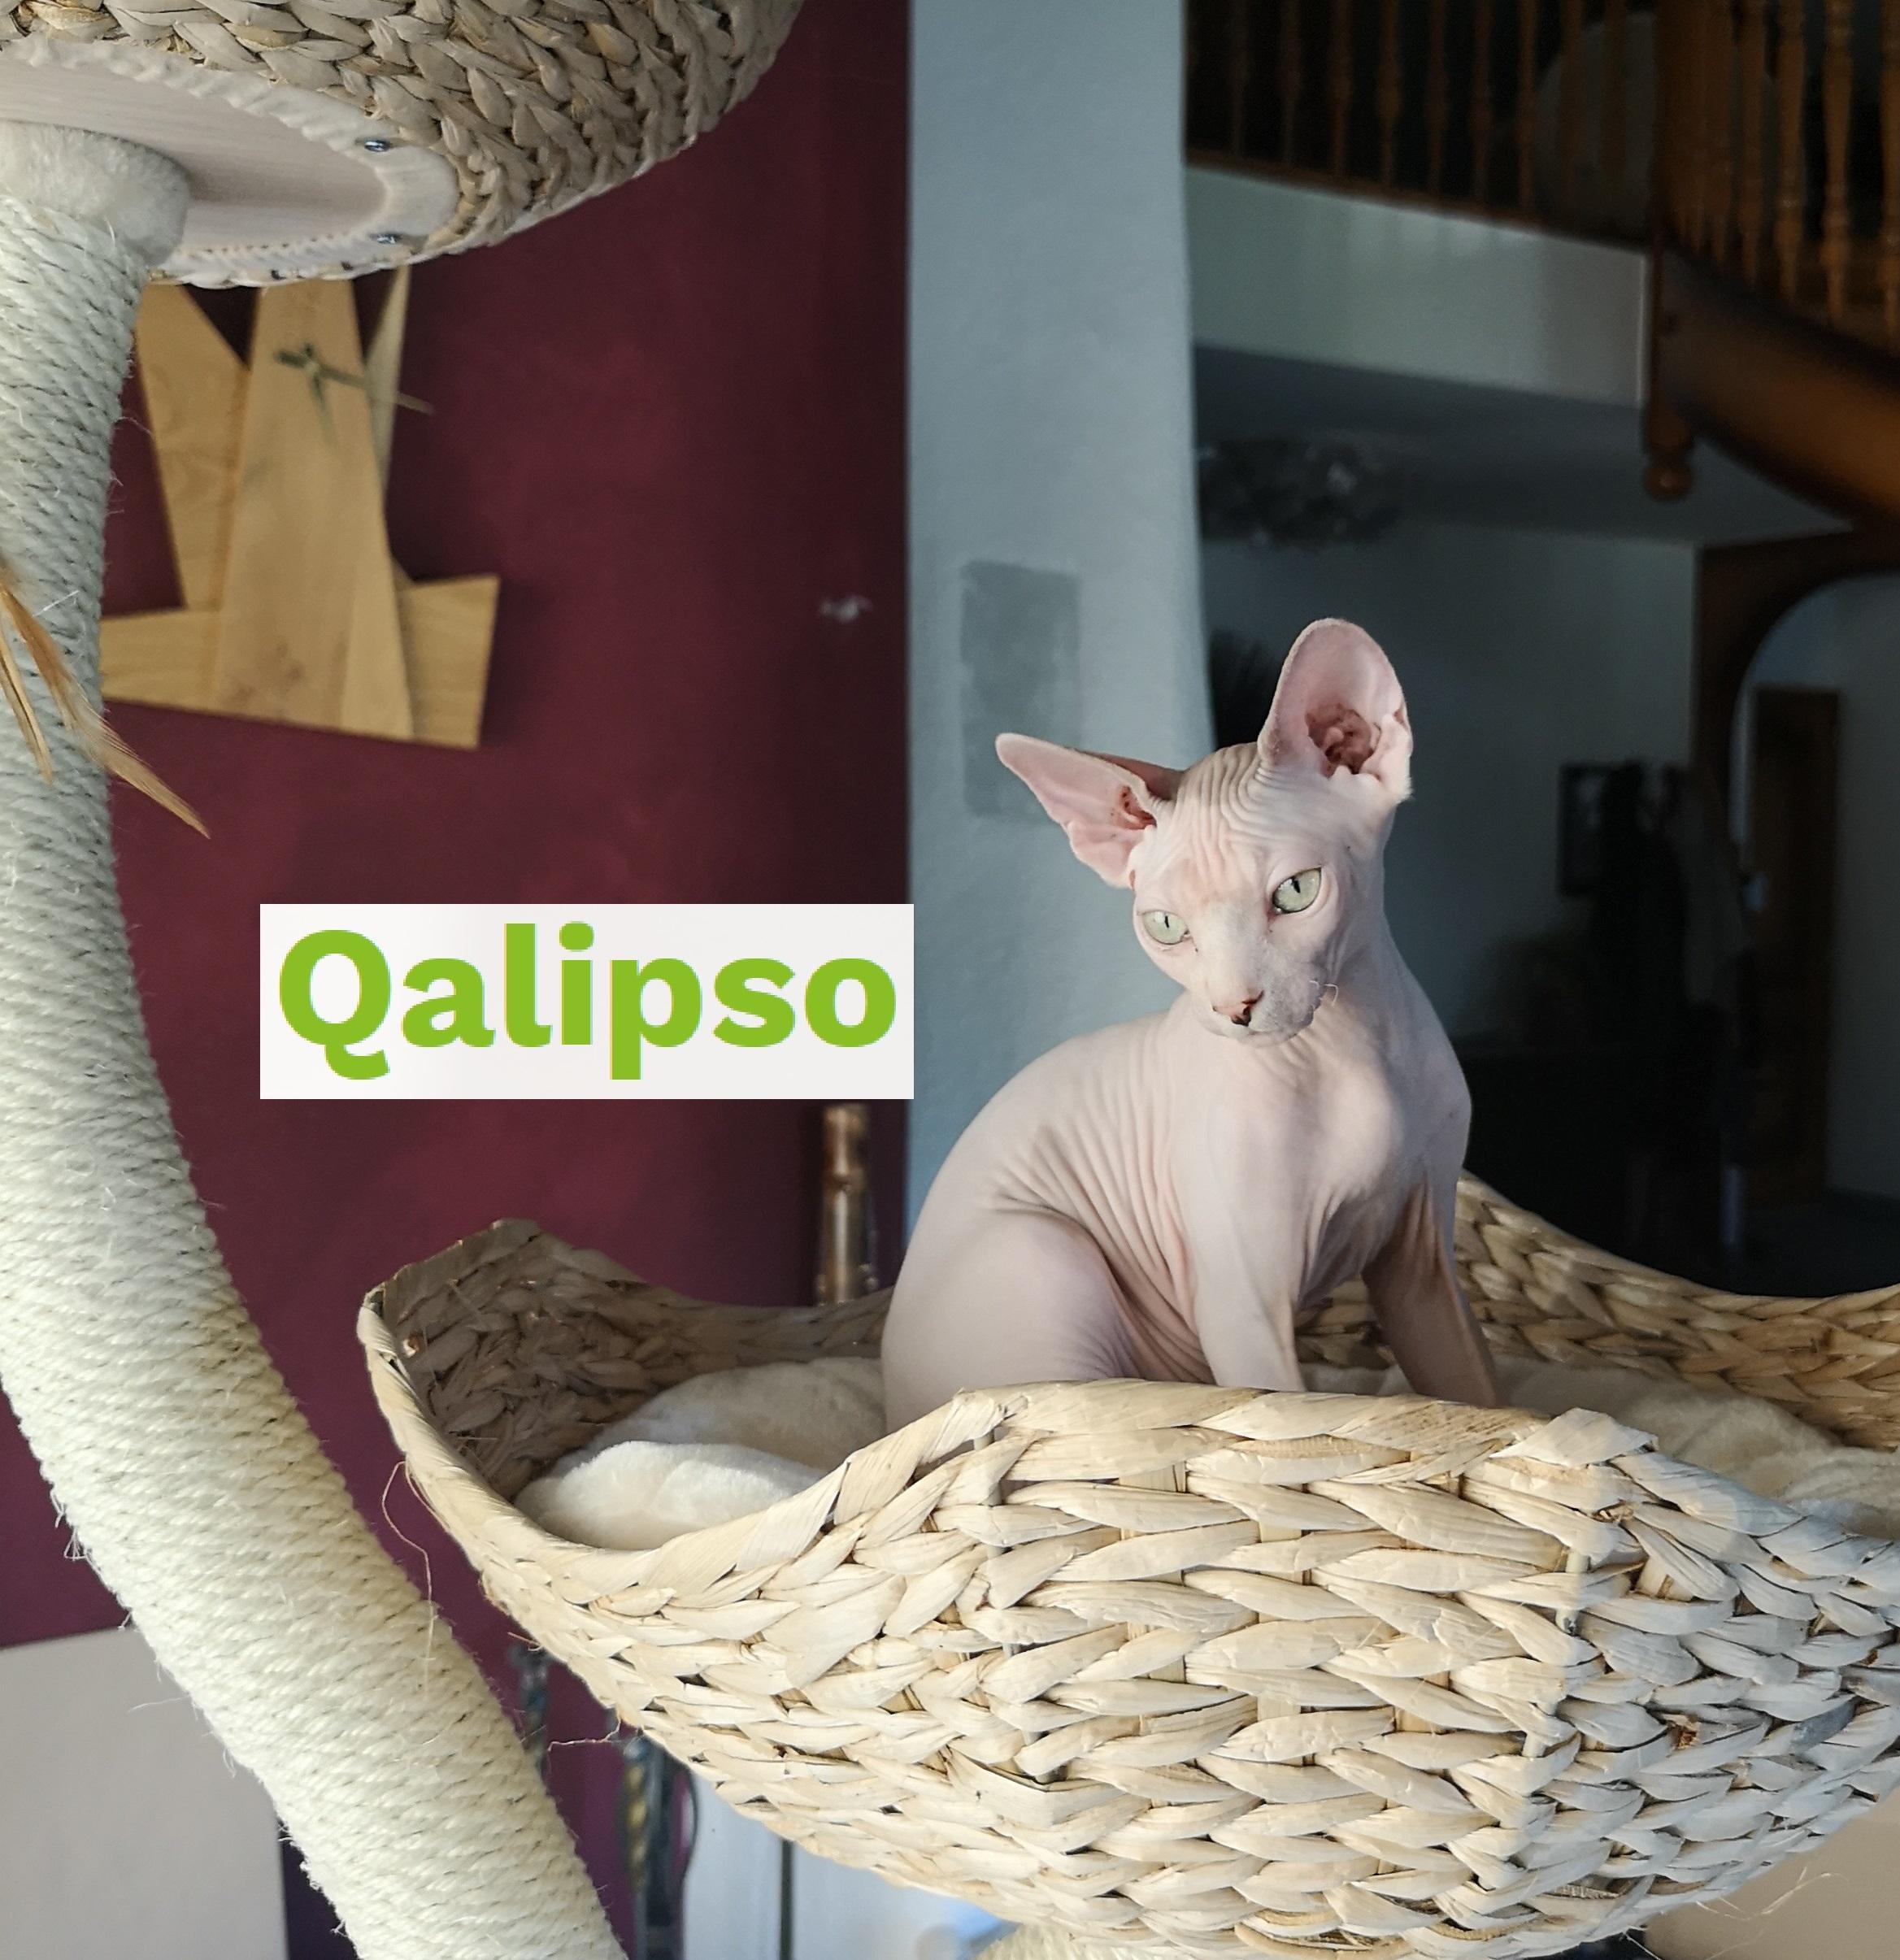 Qalipso